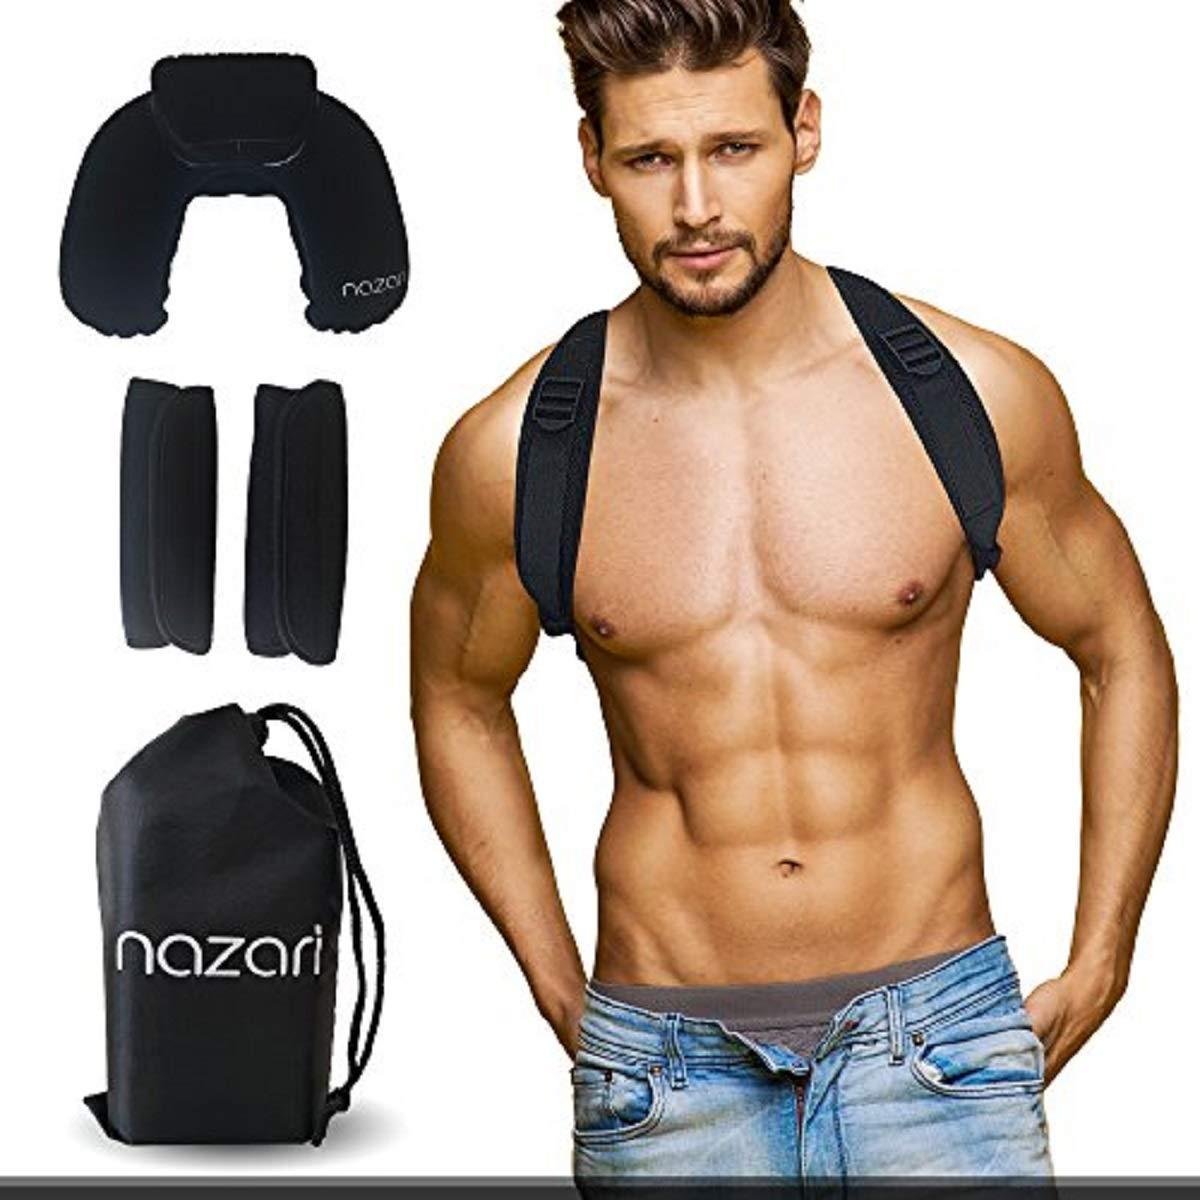 Posture Corrector Women Men - Adjustable Back Brace Support Shoulder Back Neck Pain Relief - Scoliosis Kyphosis Clavicle Brace - Plus Neck Pillow Travel Bag